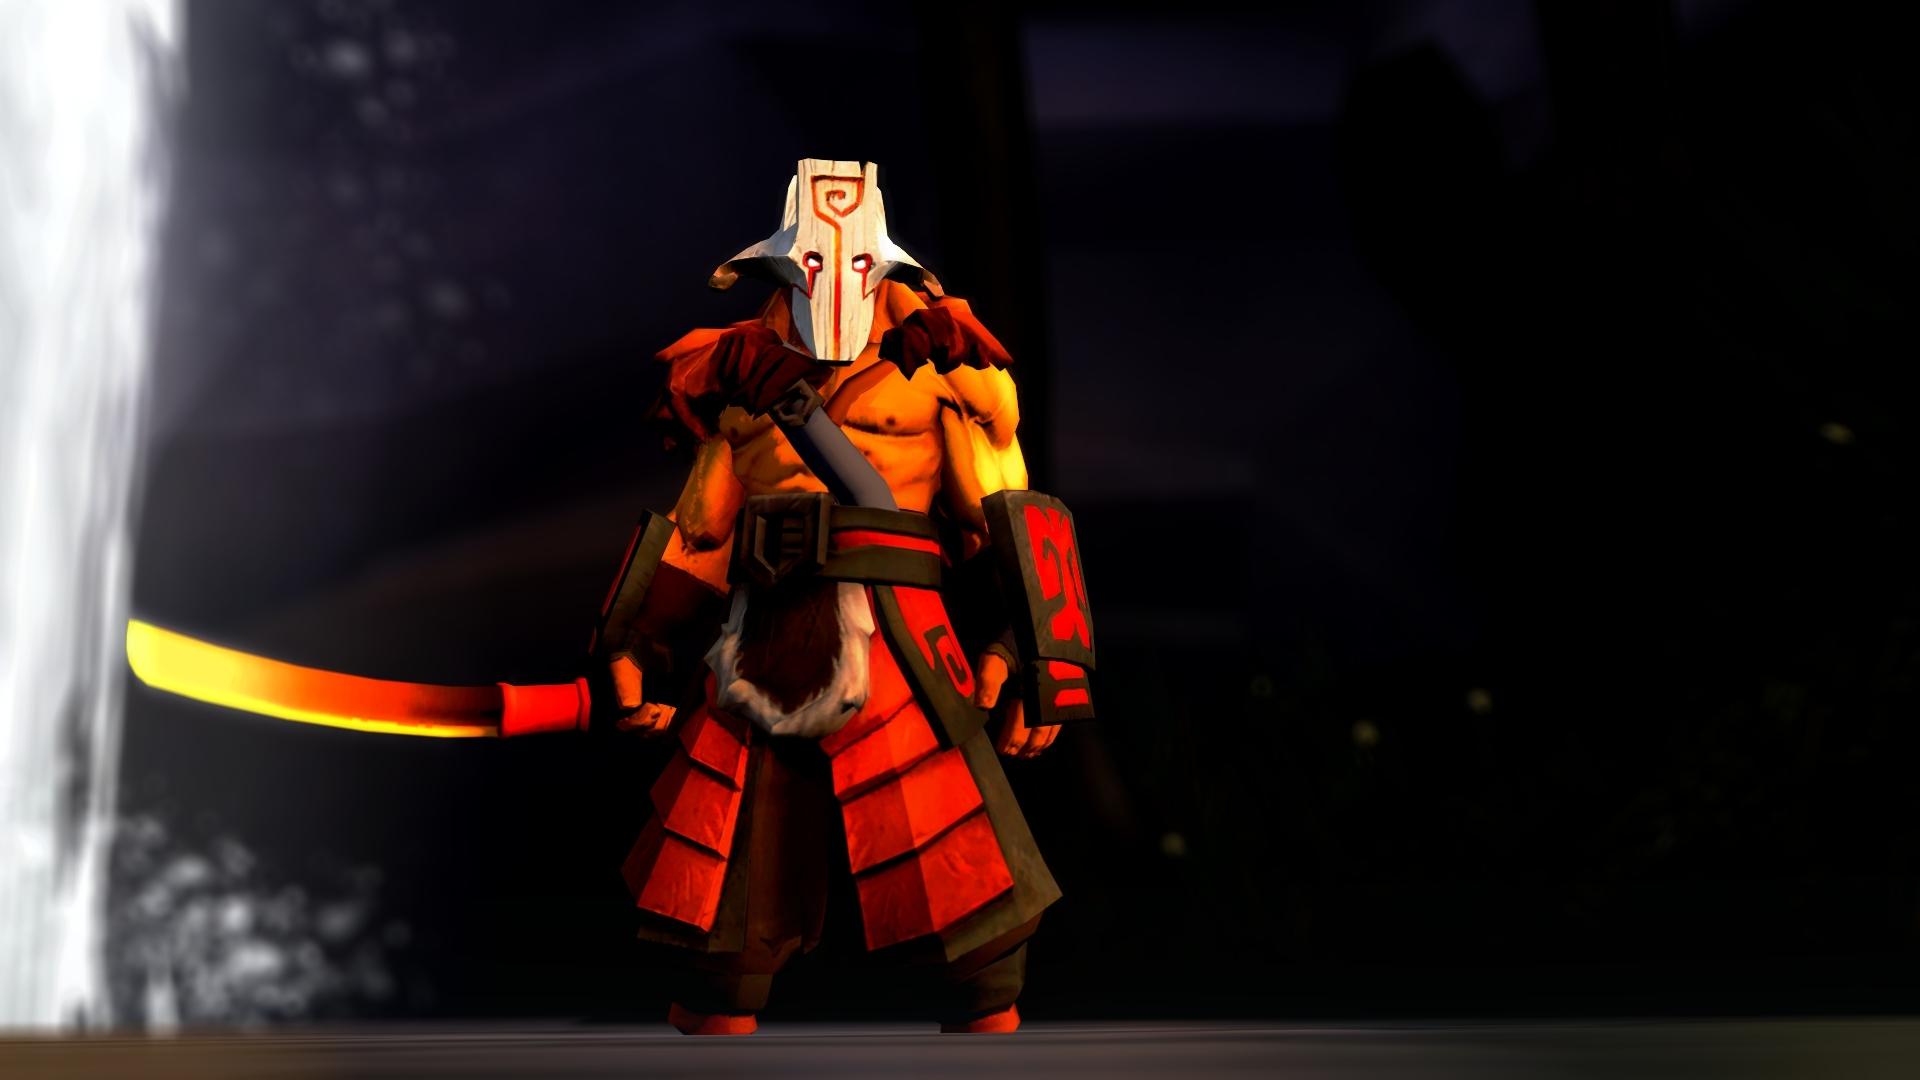 Juggernaut Dota 2 Cosplay Valve (Still) Hasn't R...